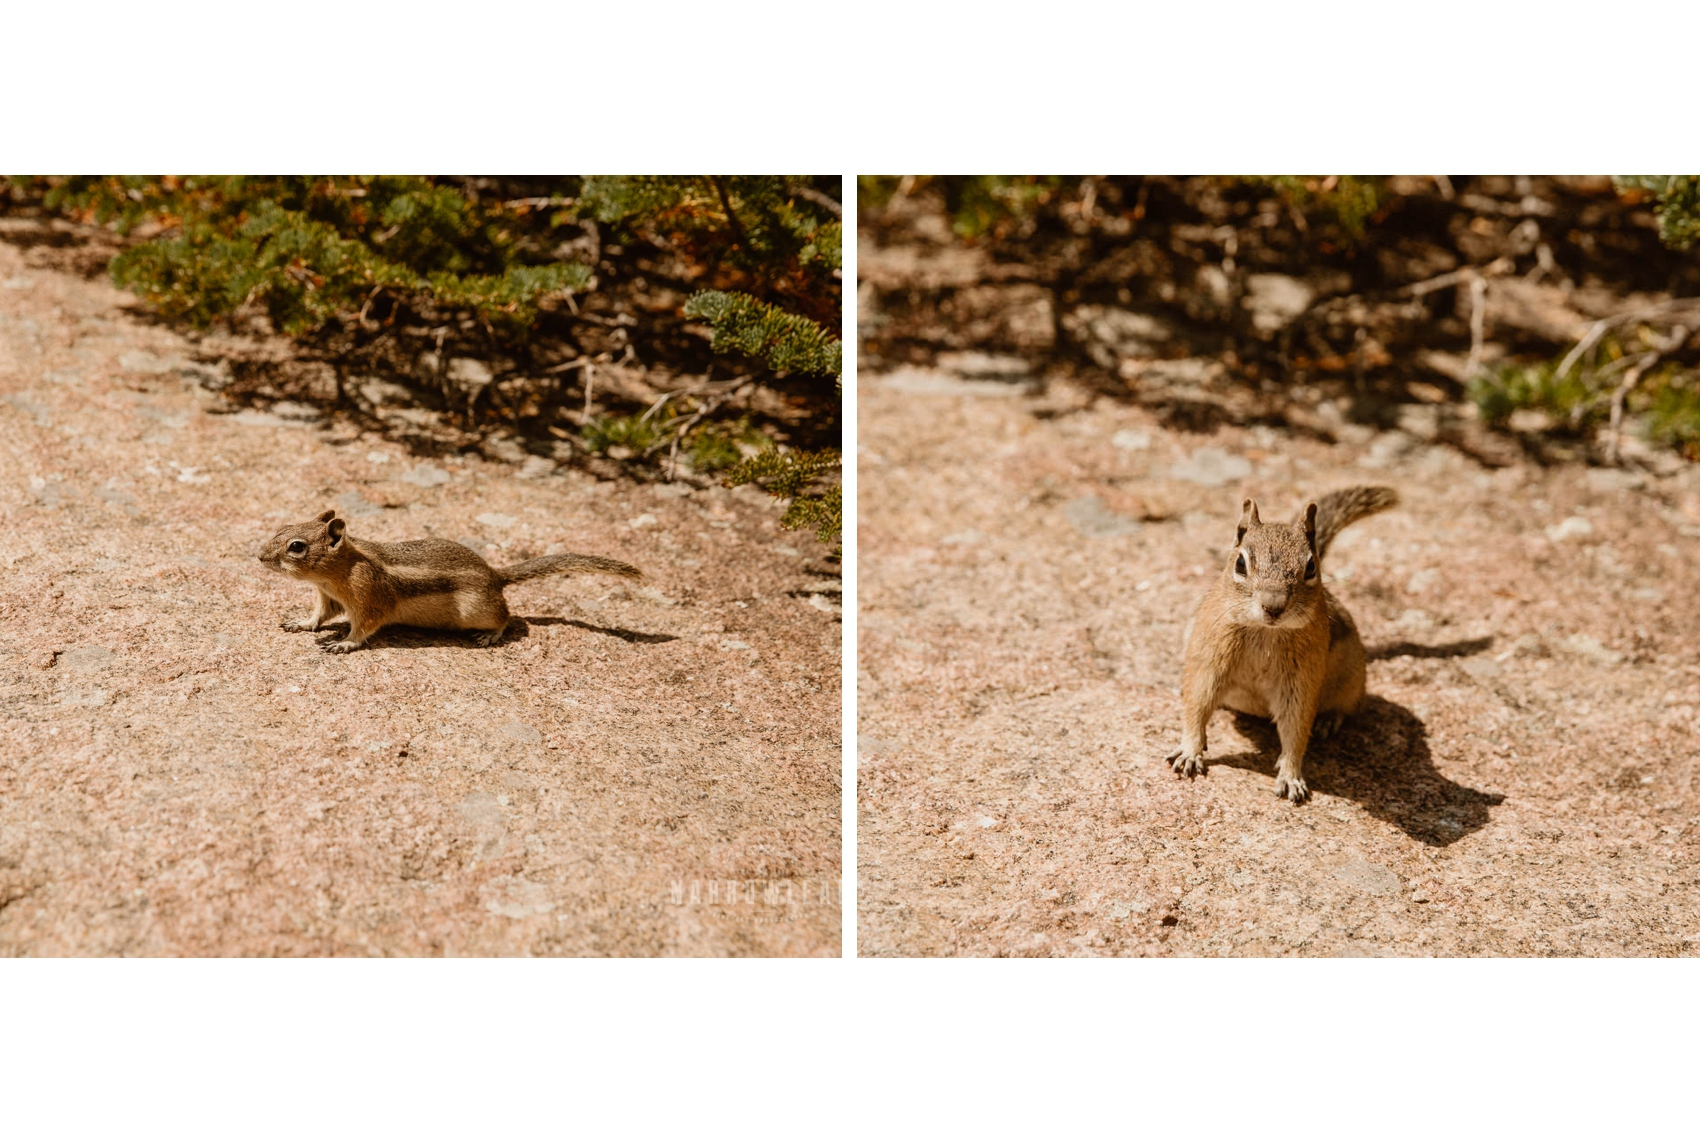 hiking-adventure-photographer-narrowleaf-photography003-004.jpg